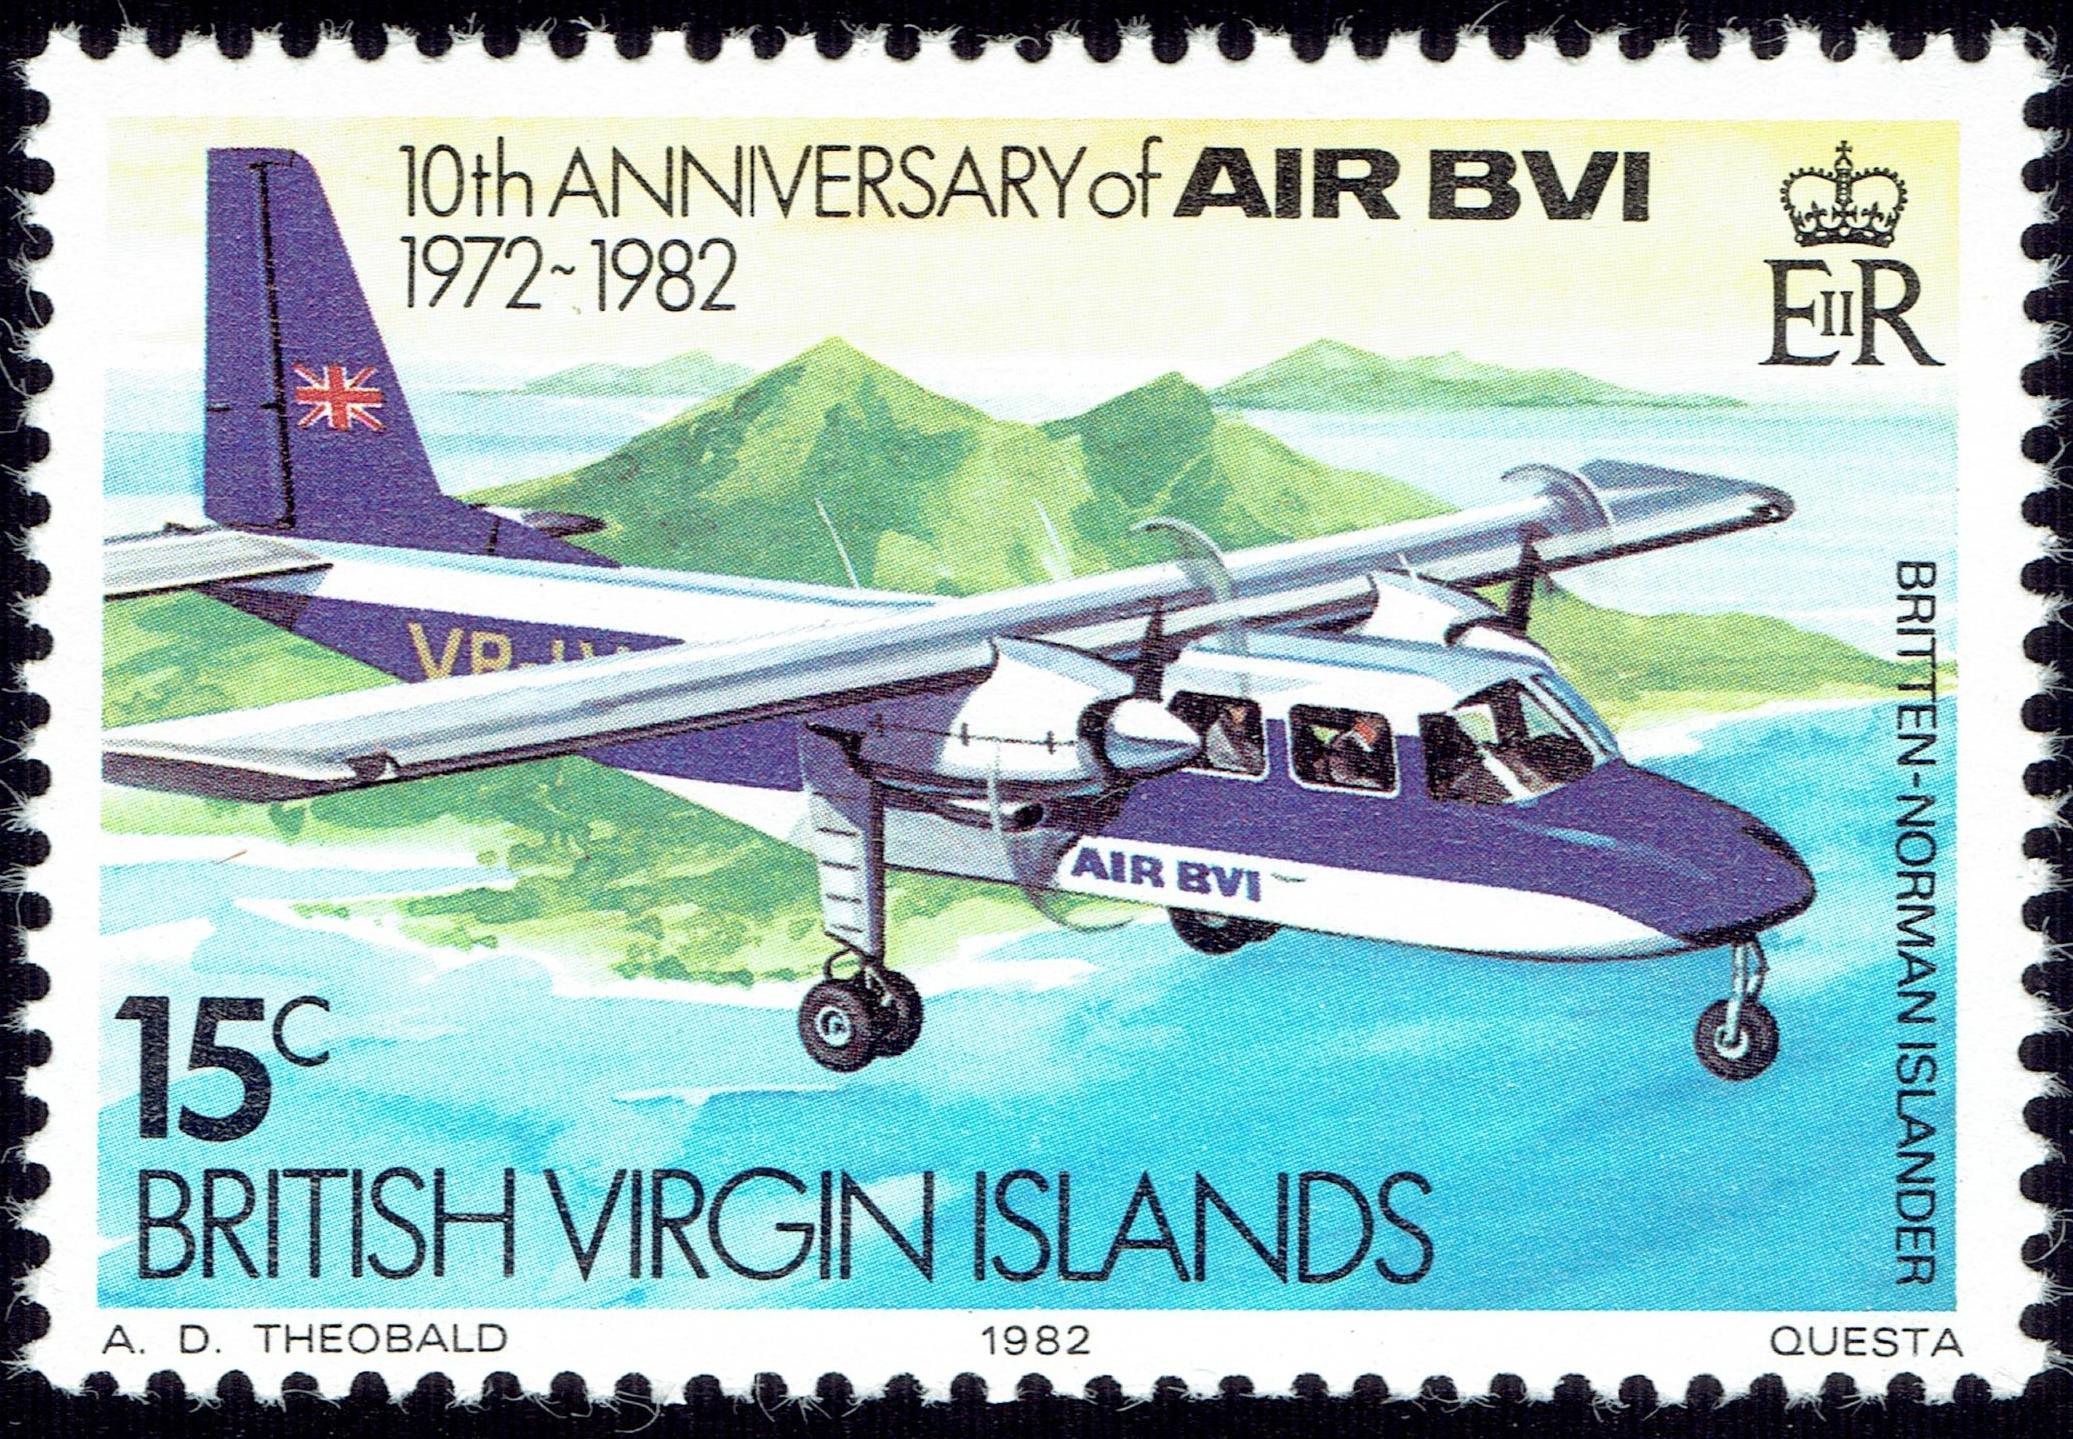 British Virgin Islands - Scott #435 (1982)